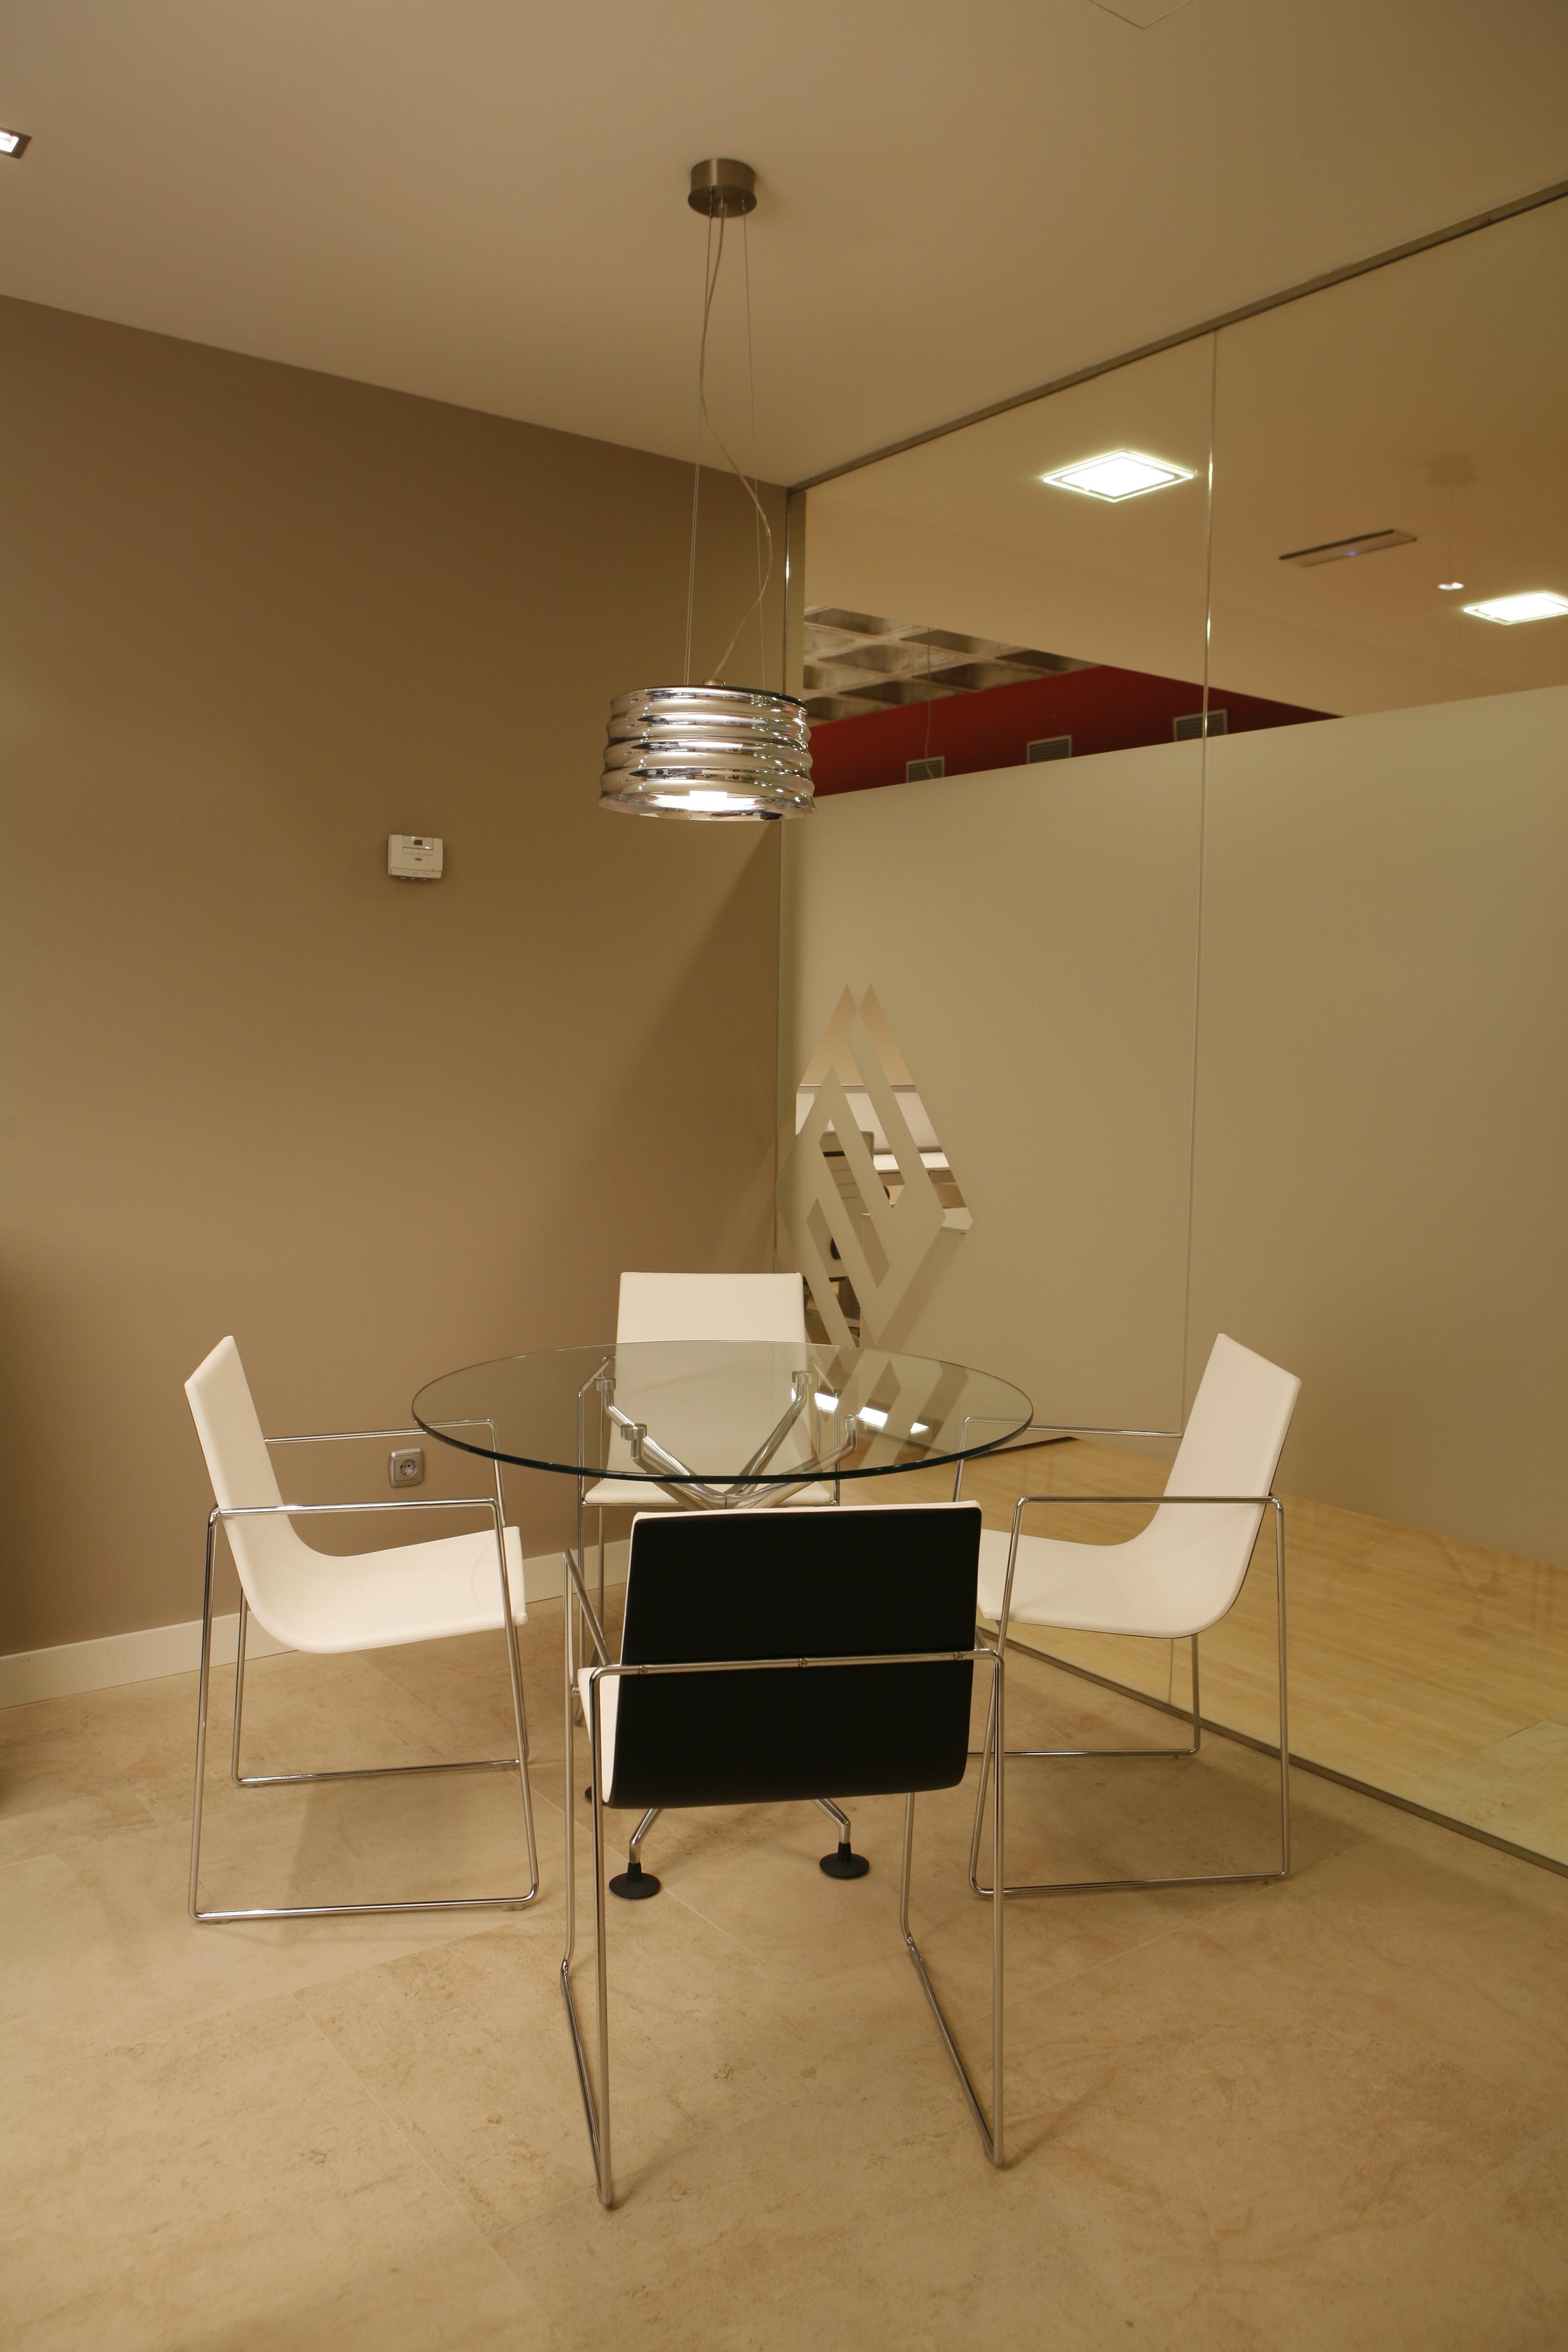 Dise o de oficinas de la constructora exbasa en bilbao for Diseno de interiores en bilbao